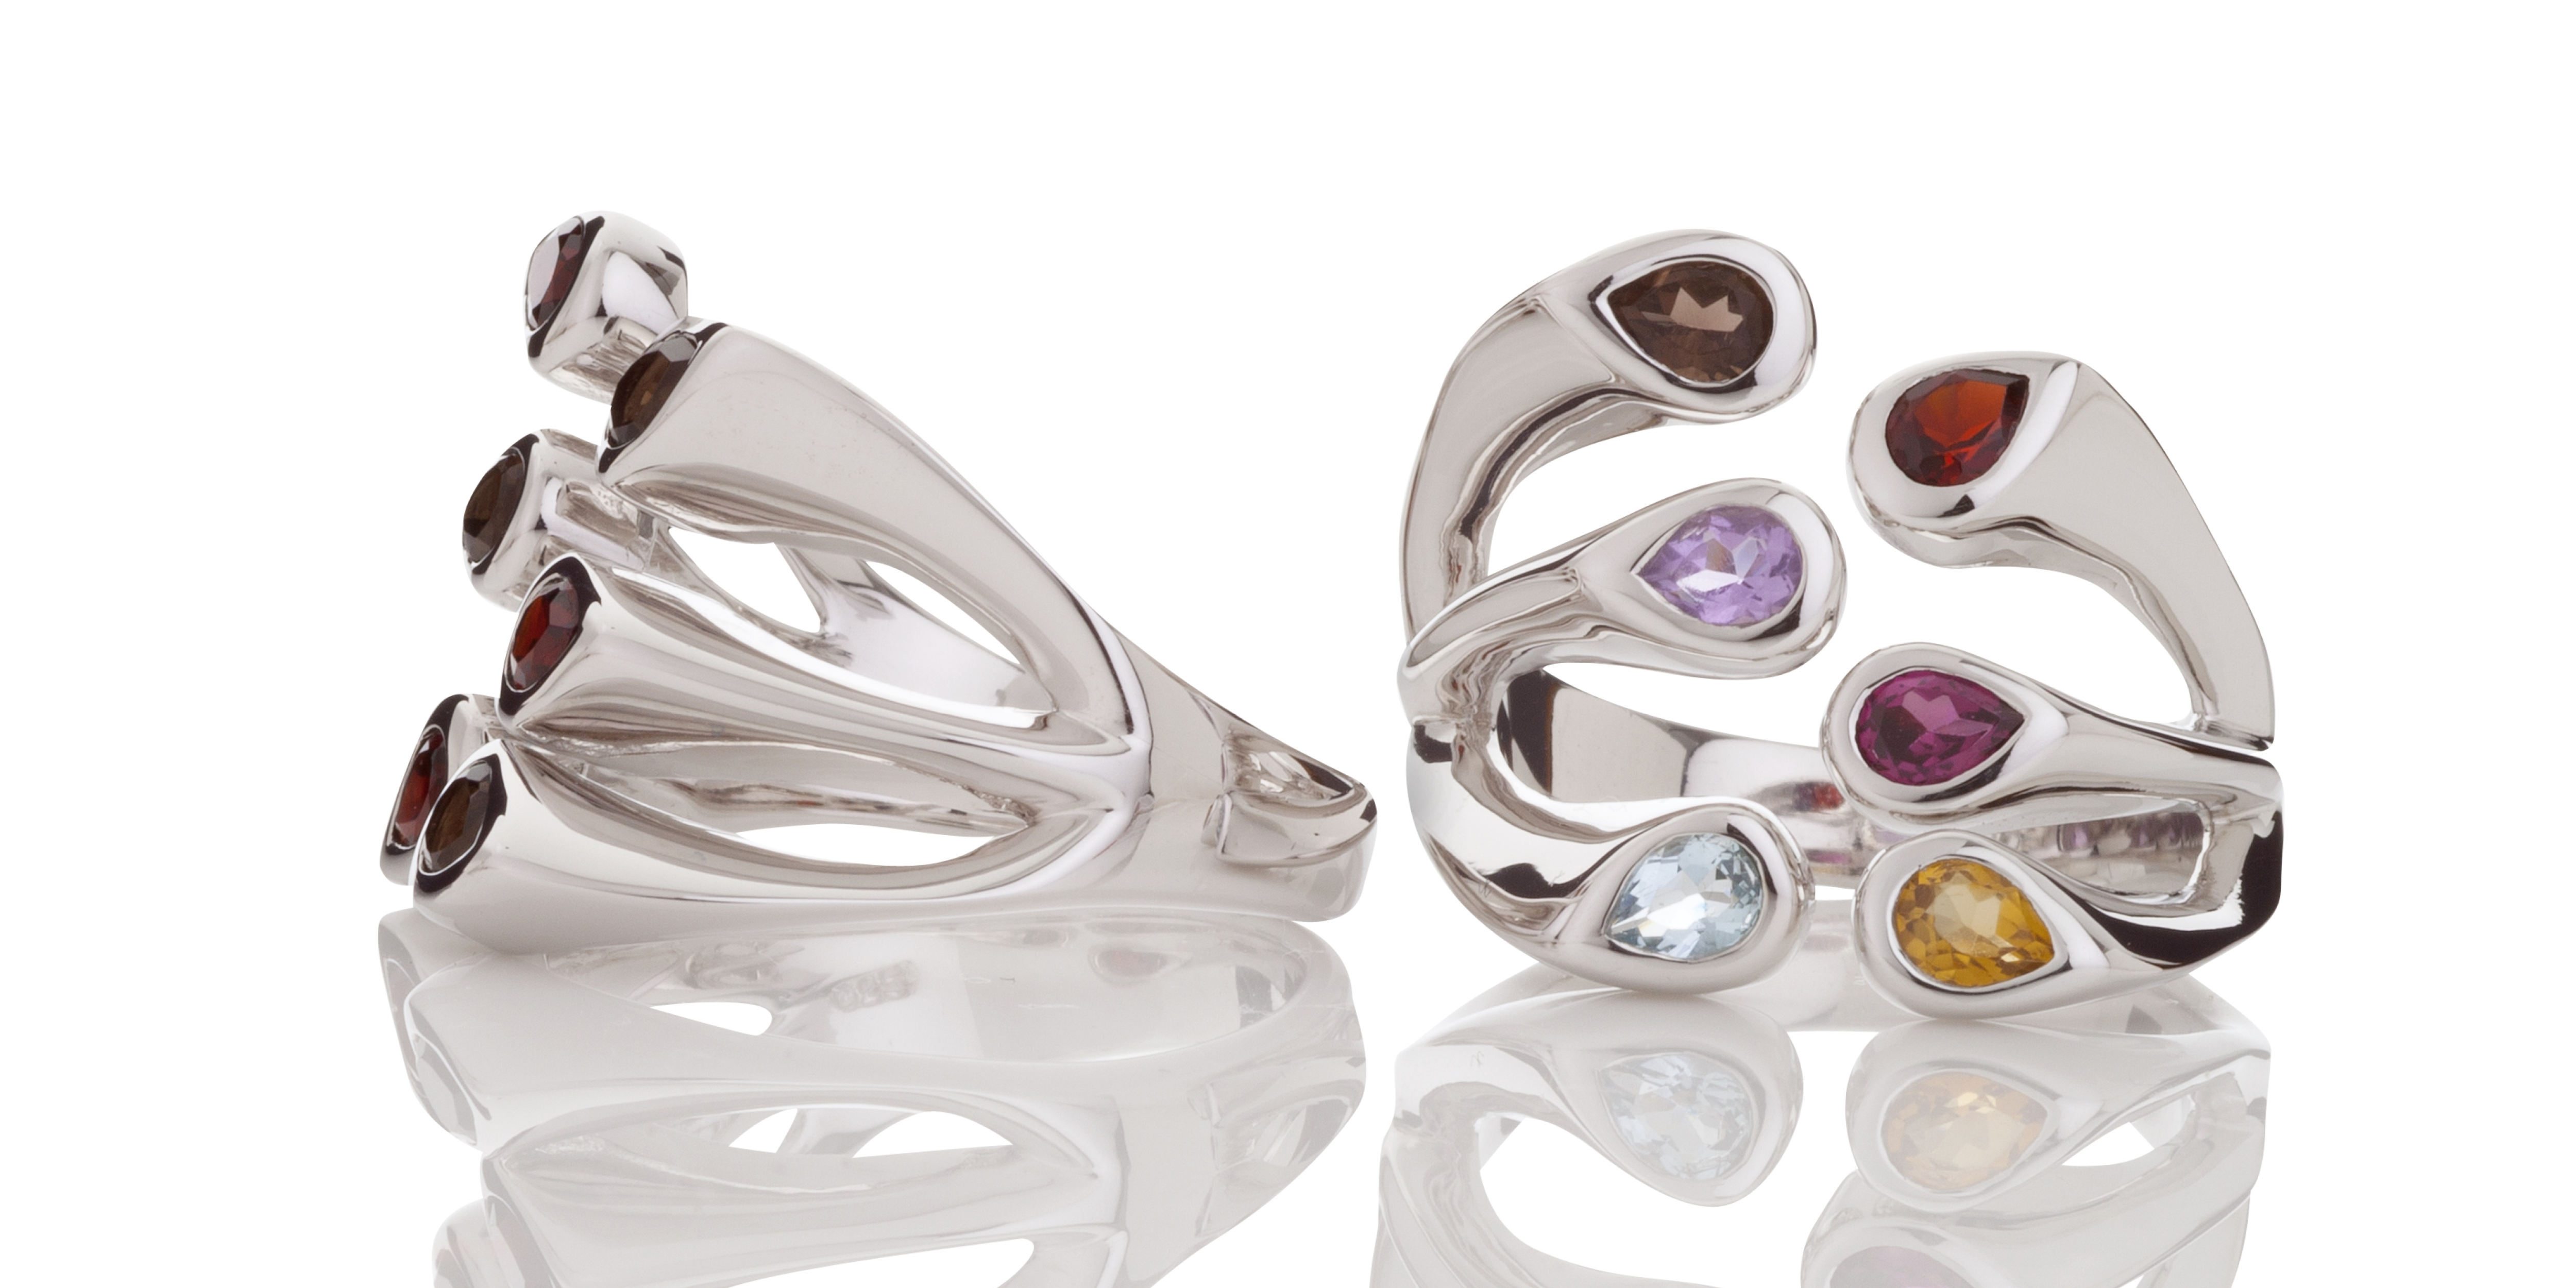 Manja - Originals Jewellers & Gallery